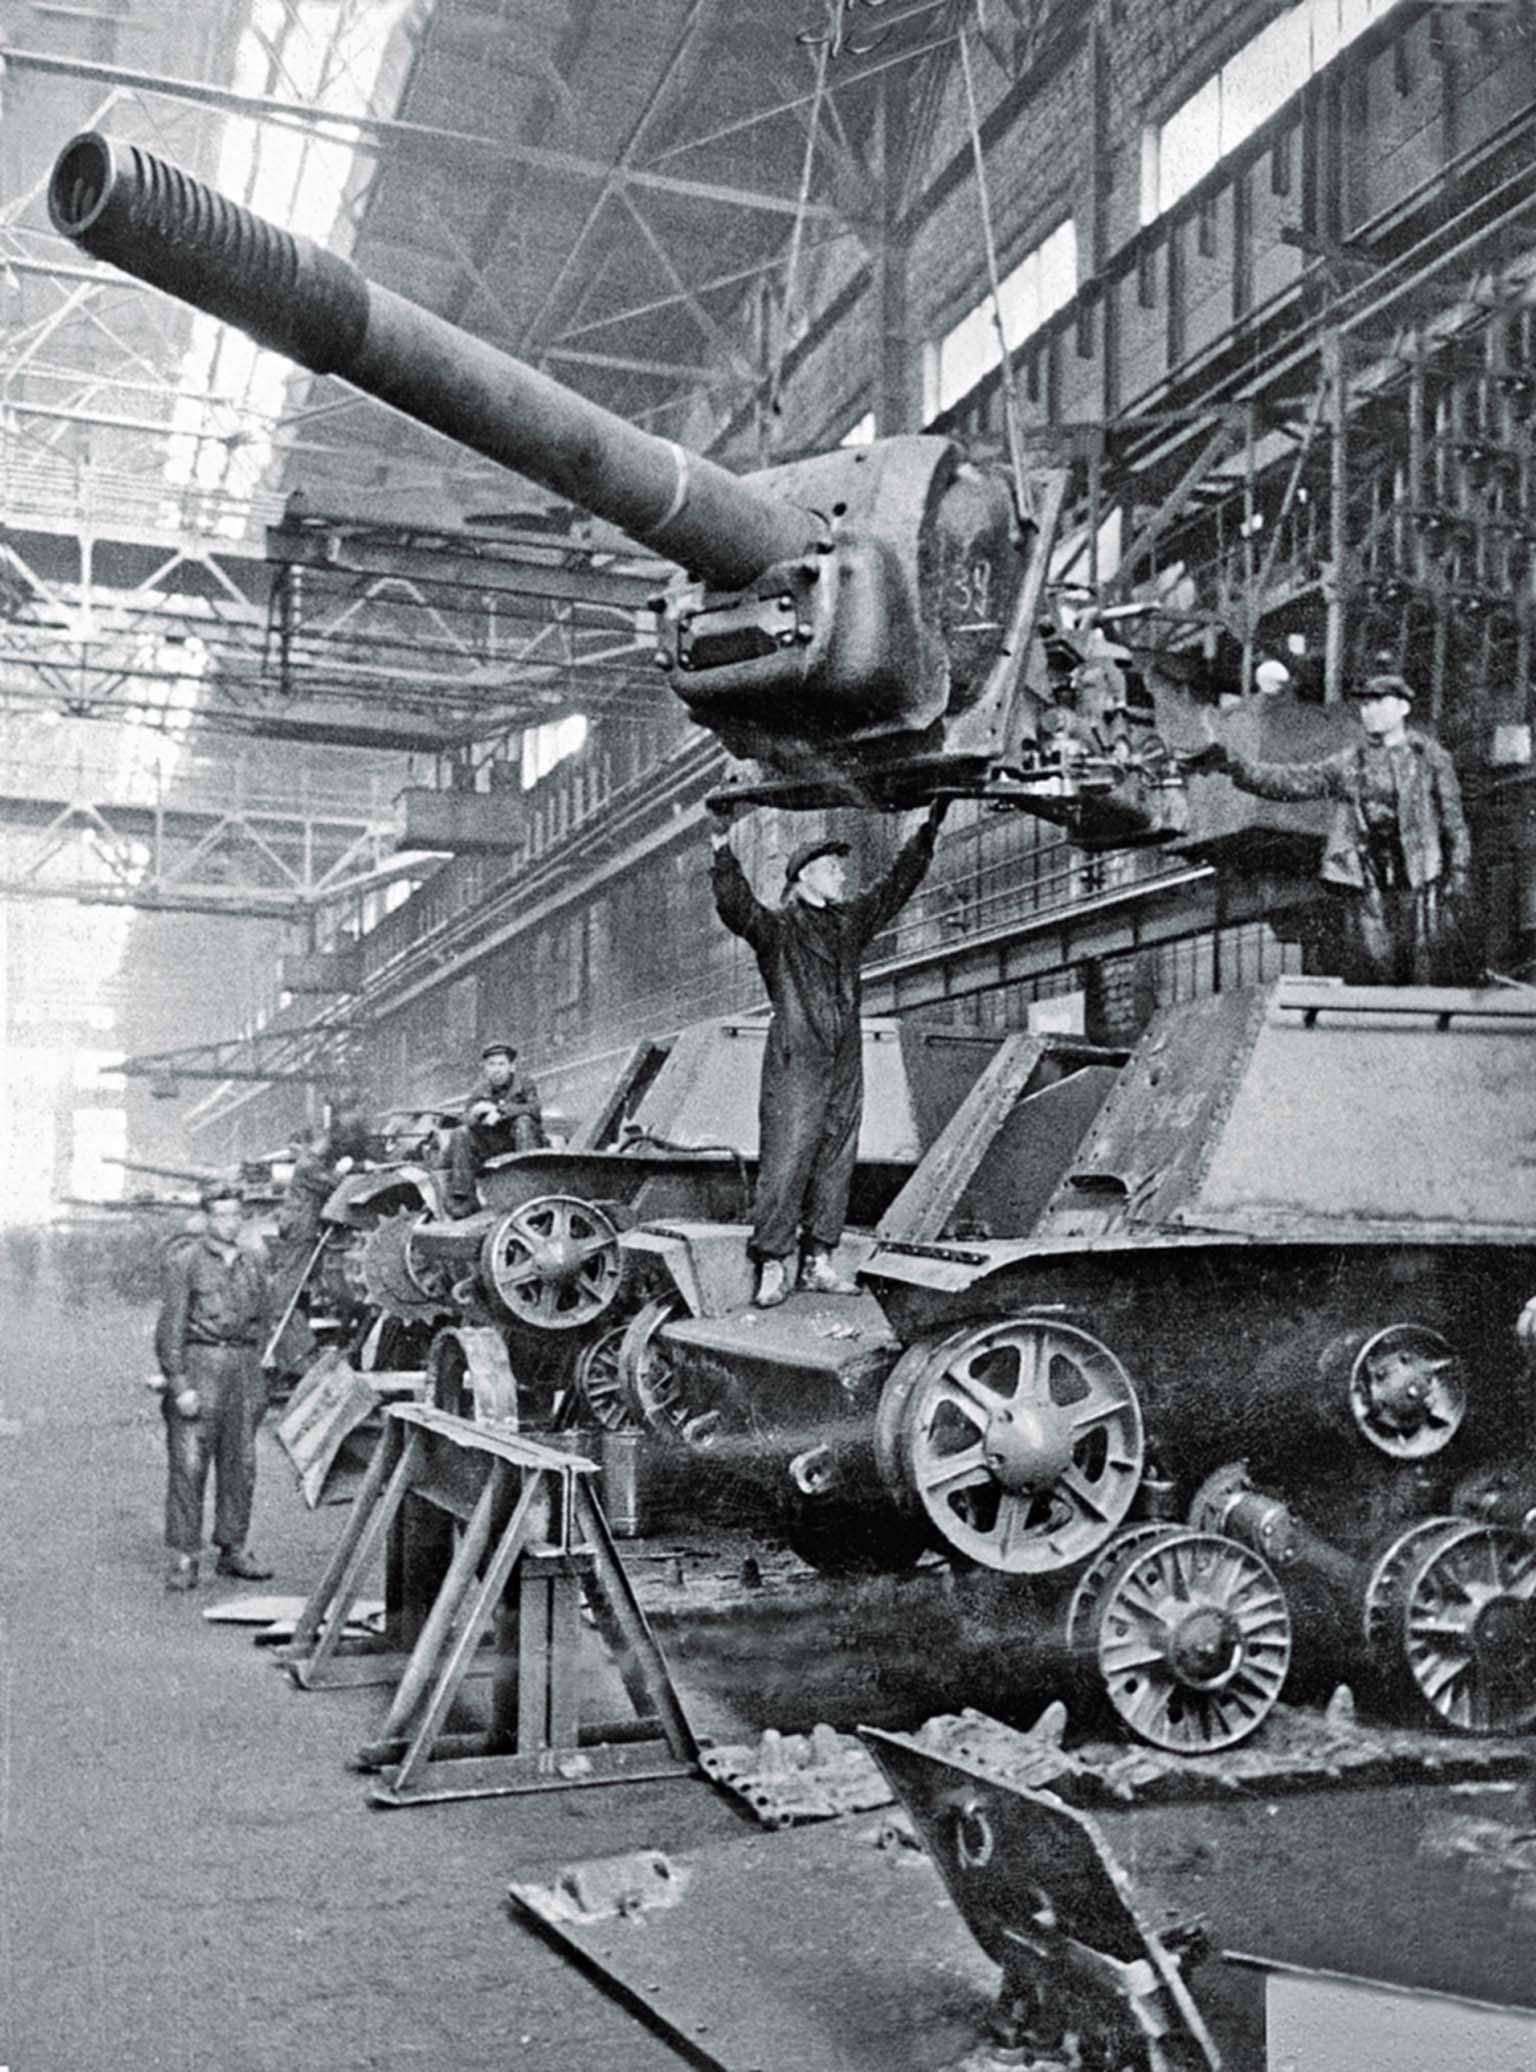 SU-152